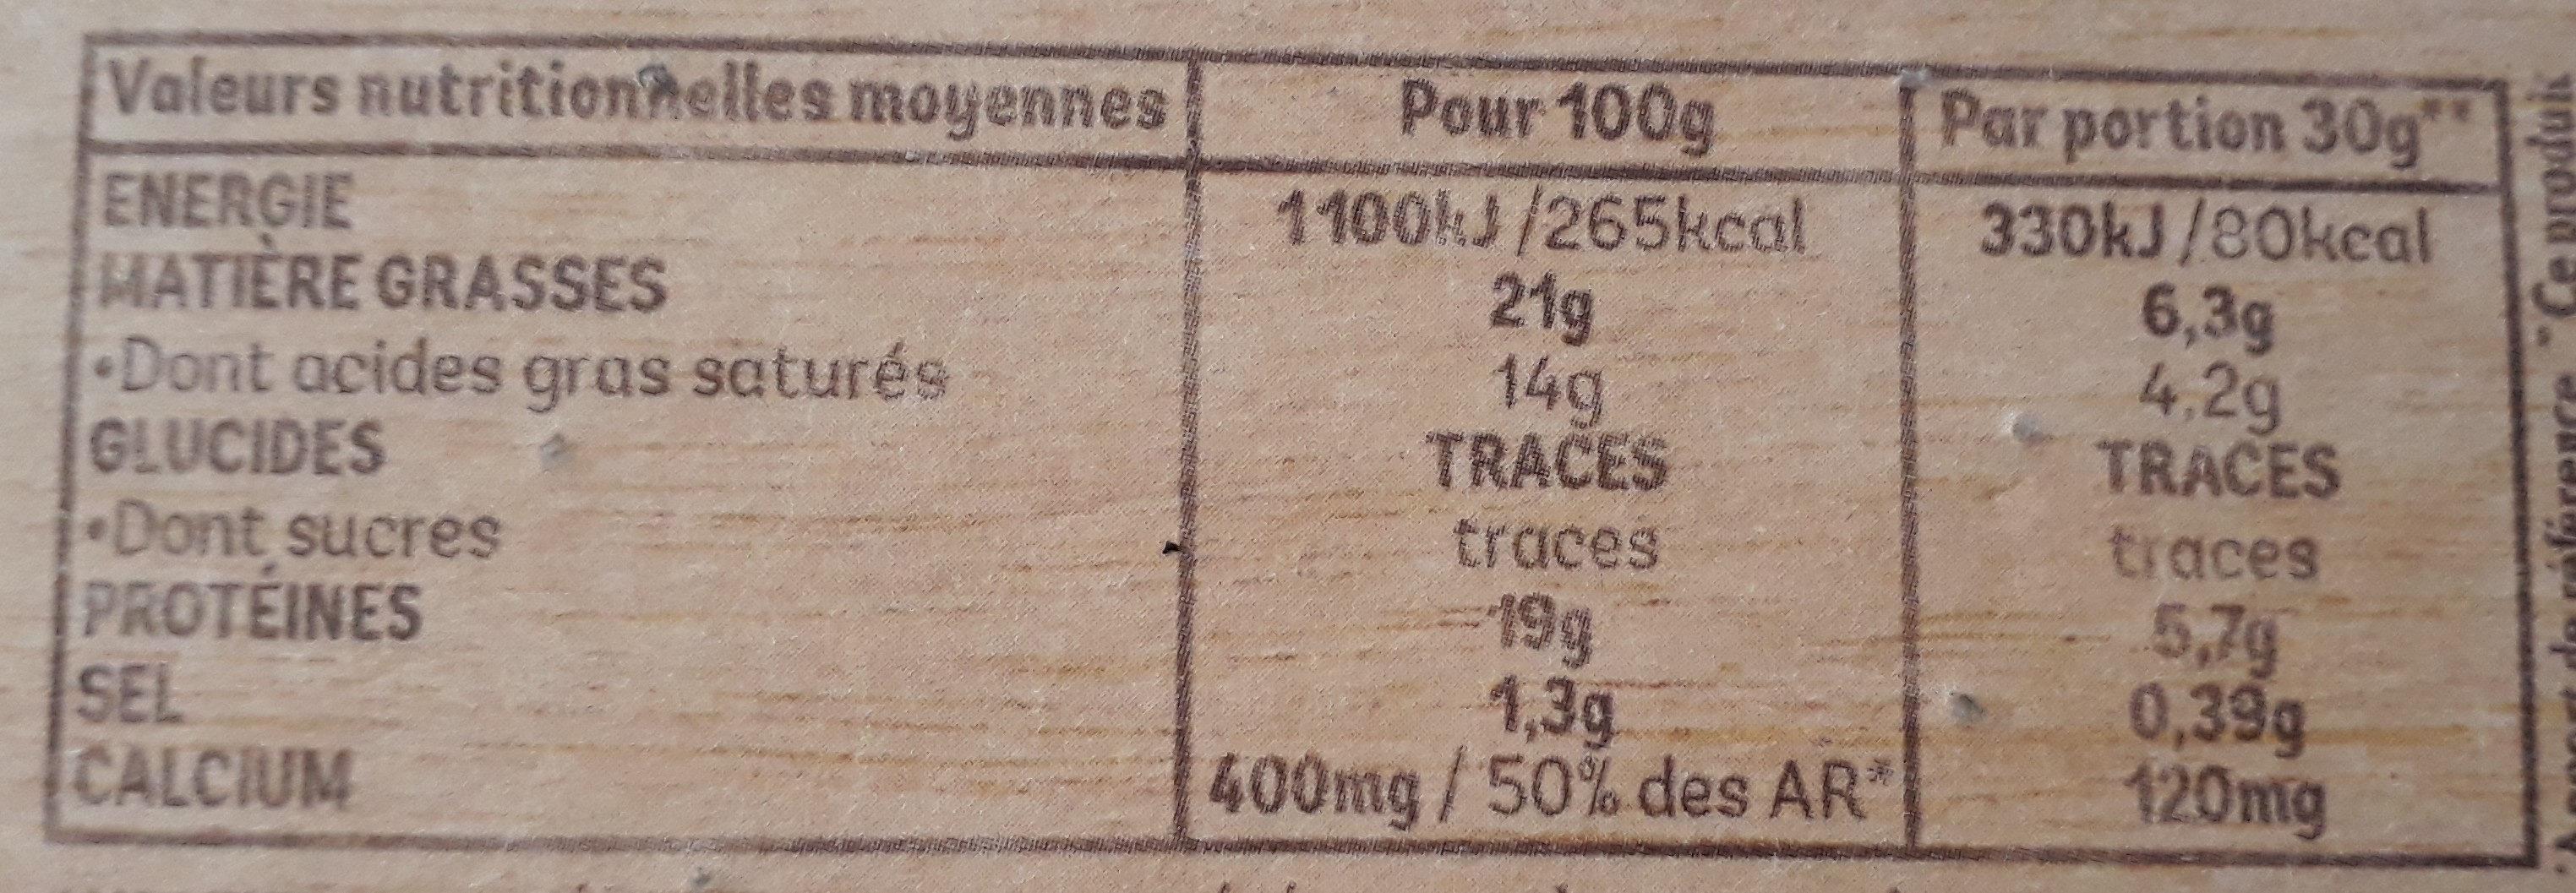 Camembert Auguste Lepetit & fils (21 % MG) - Informations nutritionnelles - fr